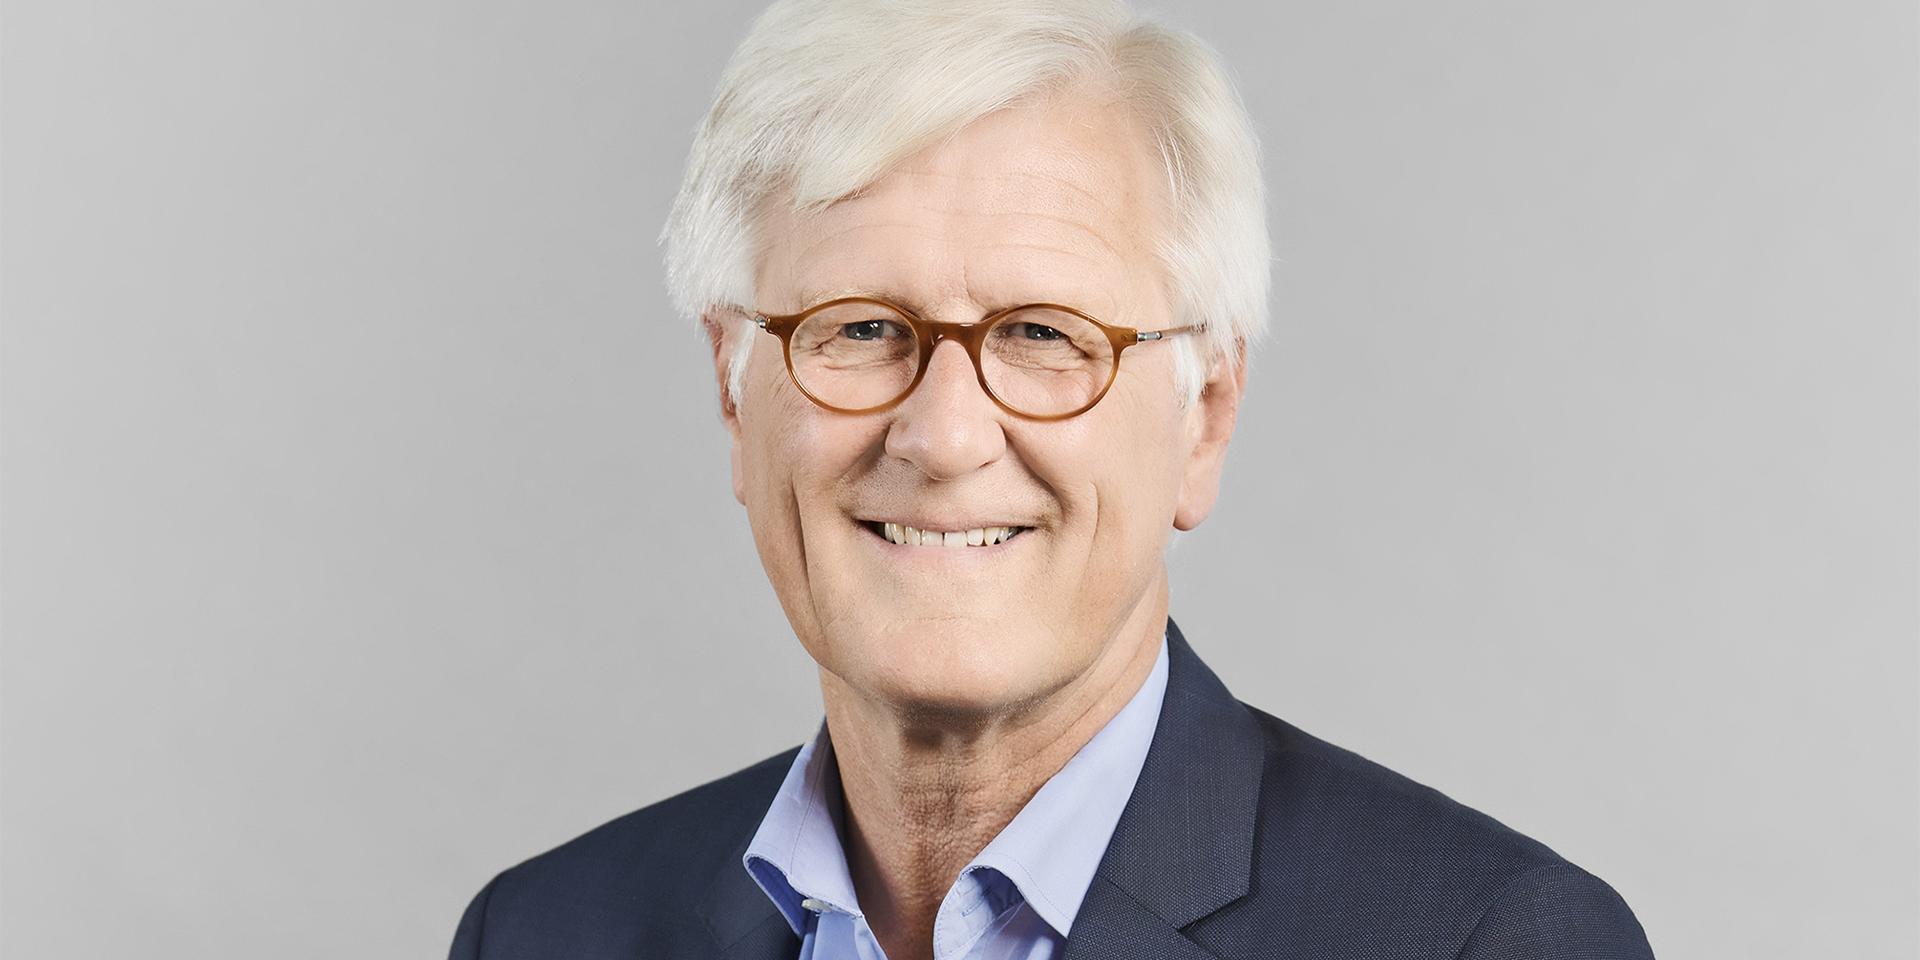 Professor Dr. Heinrich Bedford-Strohm